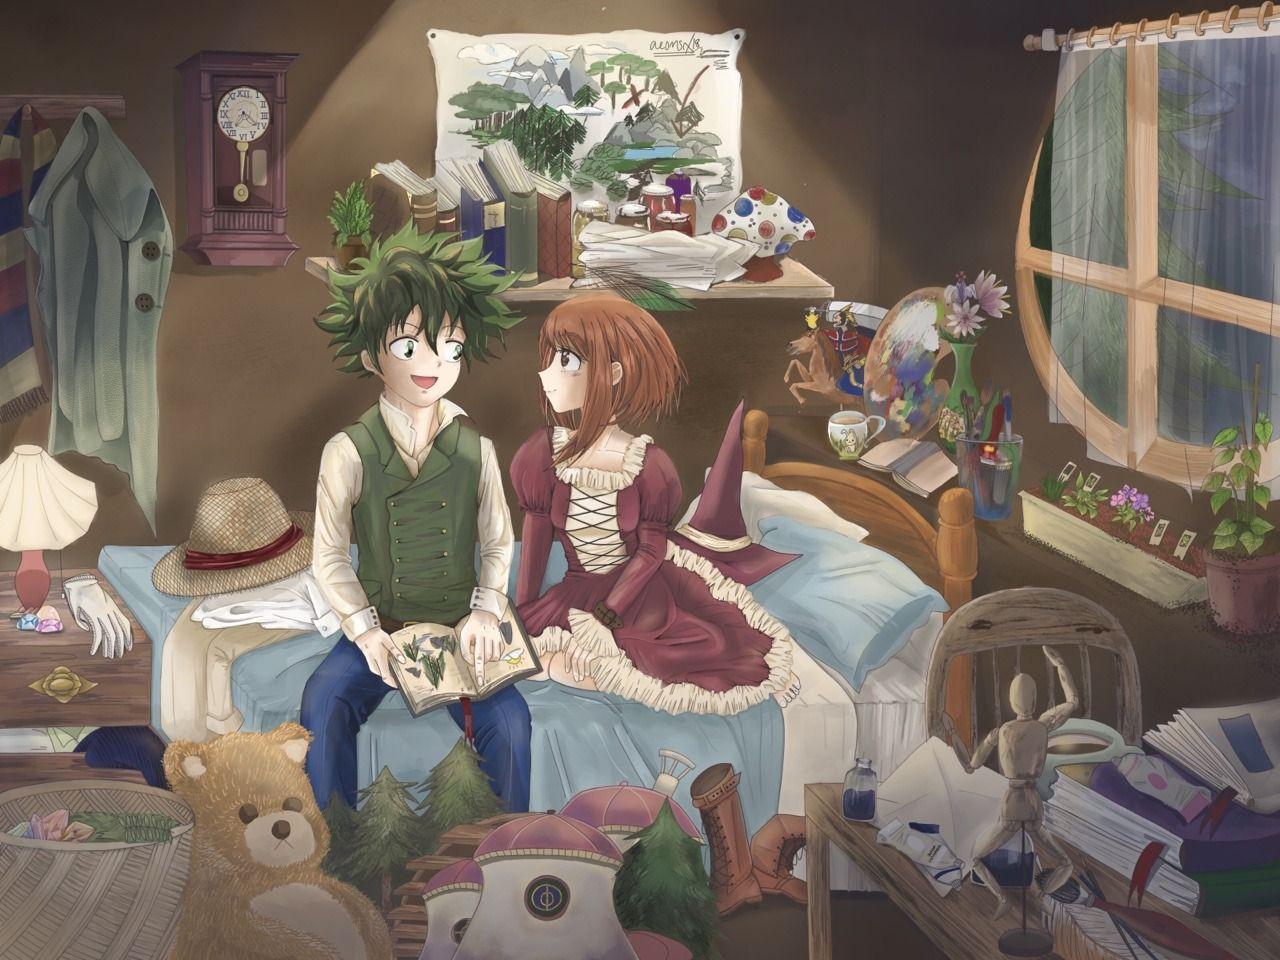 Pin By Justin Houlihan On Midoriya Izuku Deku And Uraraka Ochako Izuocha Dekuocha Anime Cupples Awesome Anime Anime